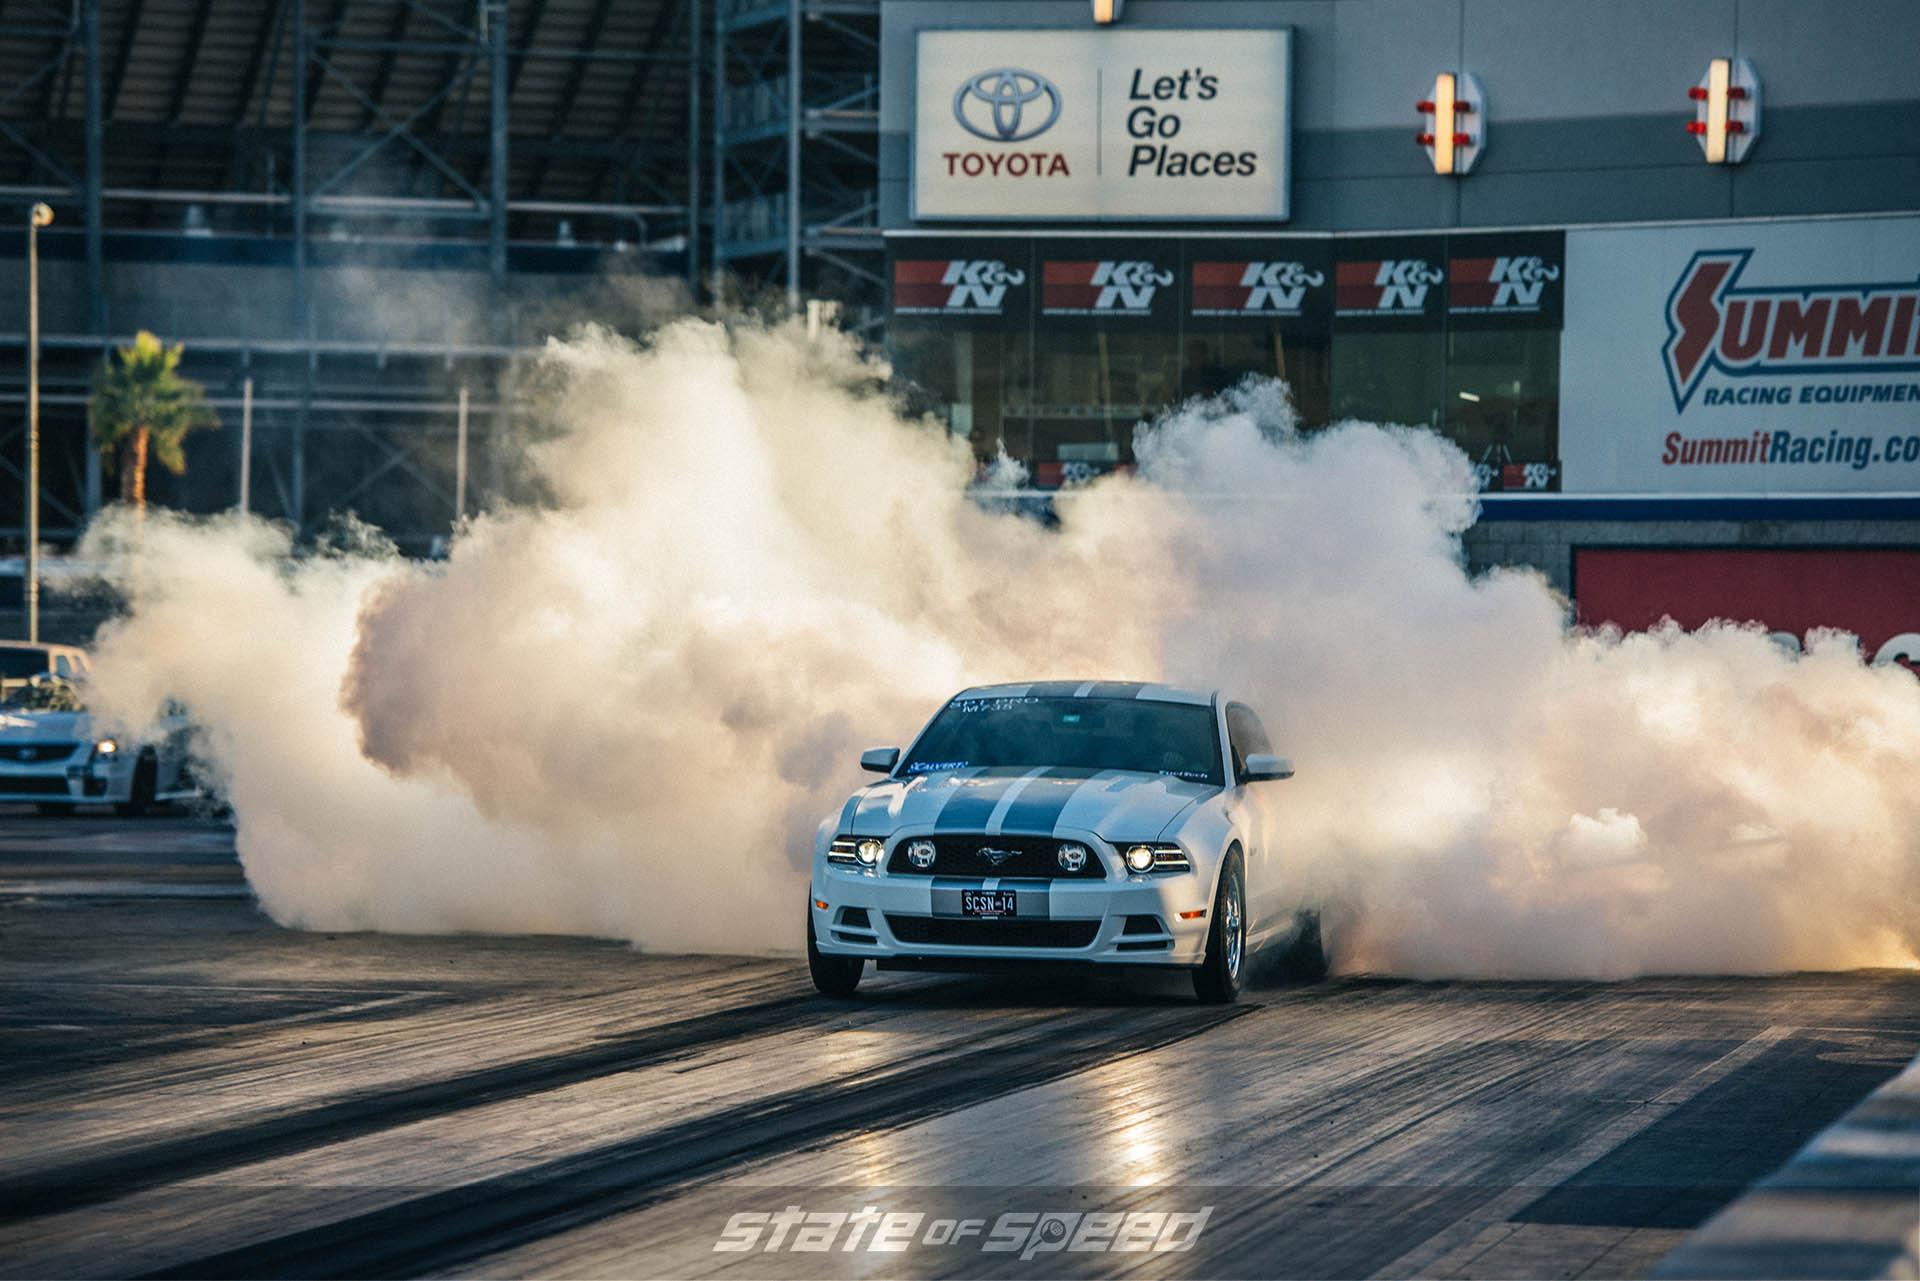 Mustang doing a burnout